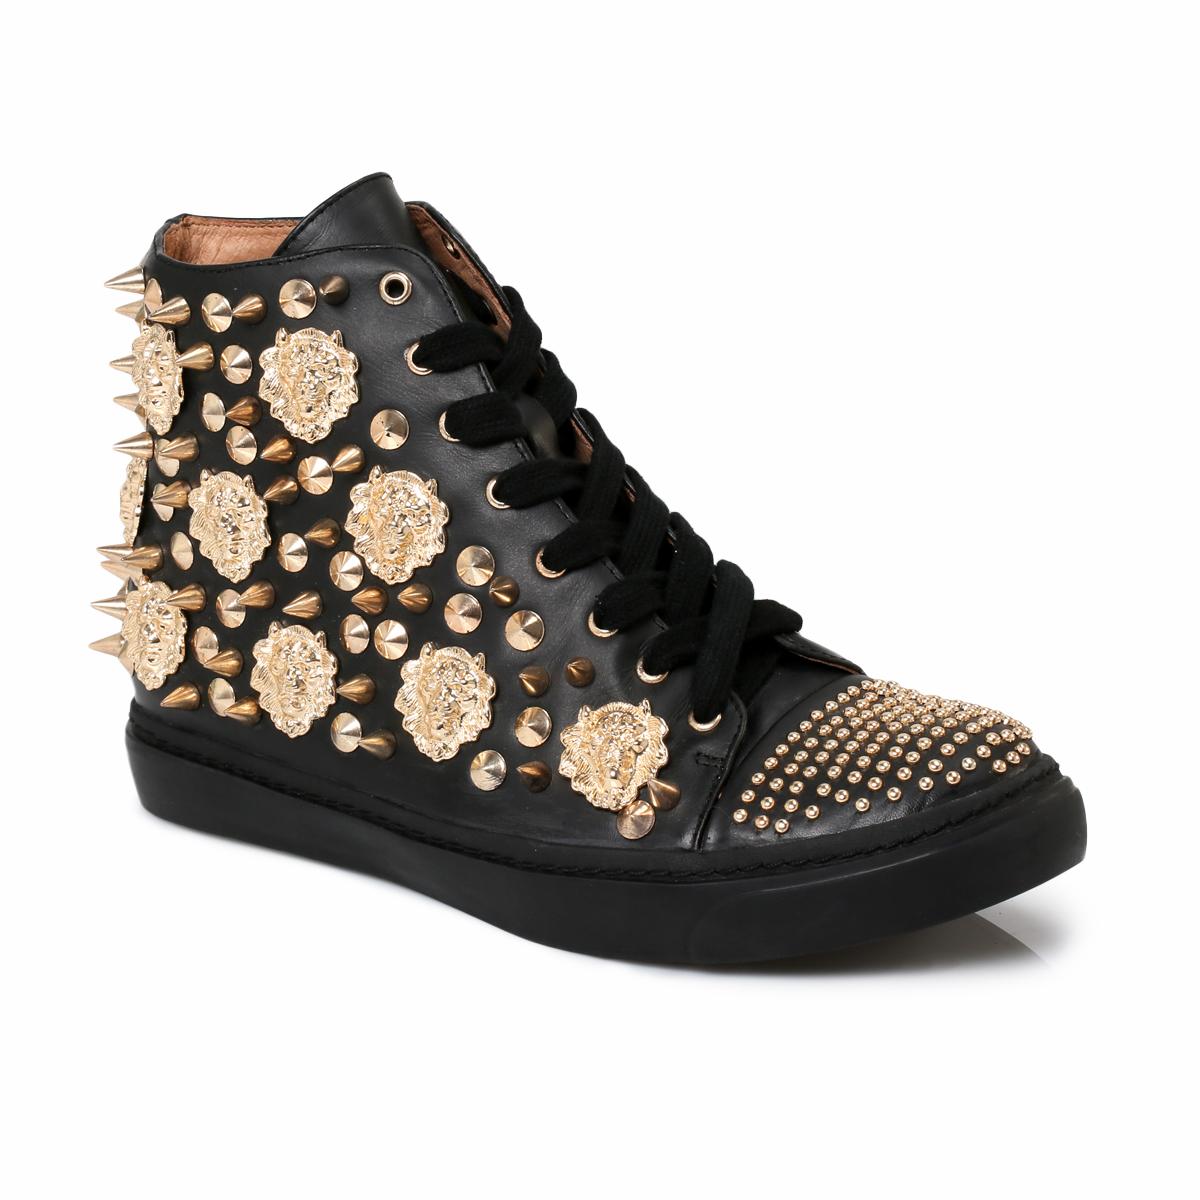 heels with studs, studded stilettos, stud pumps